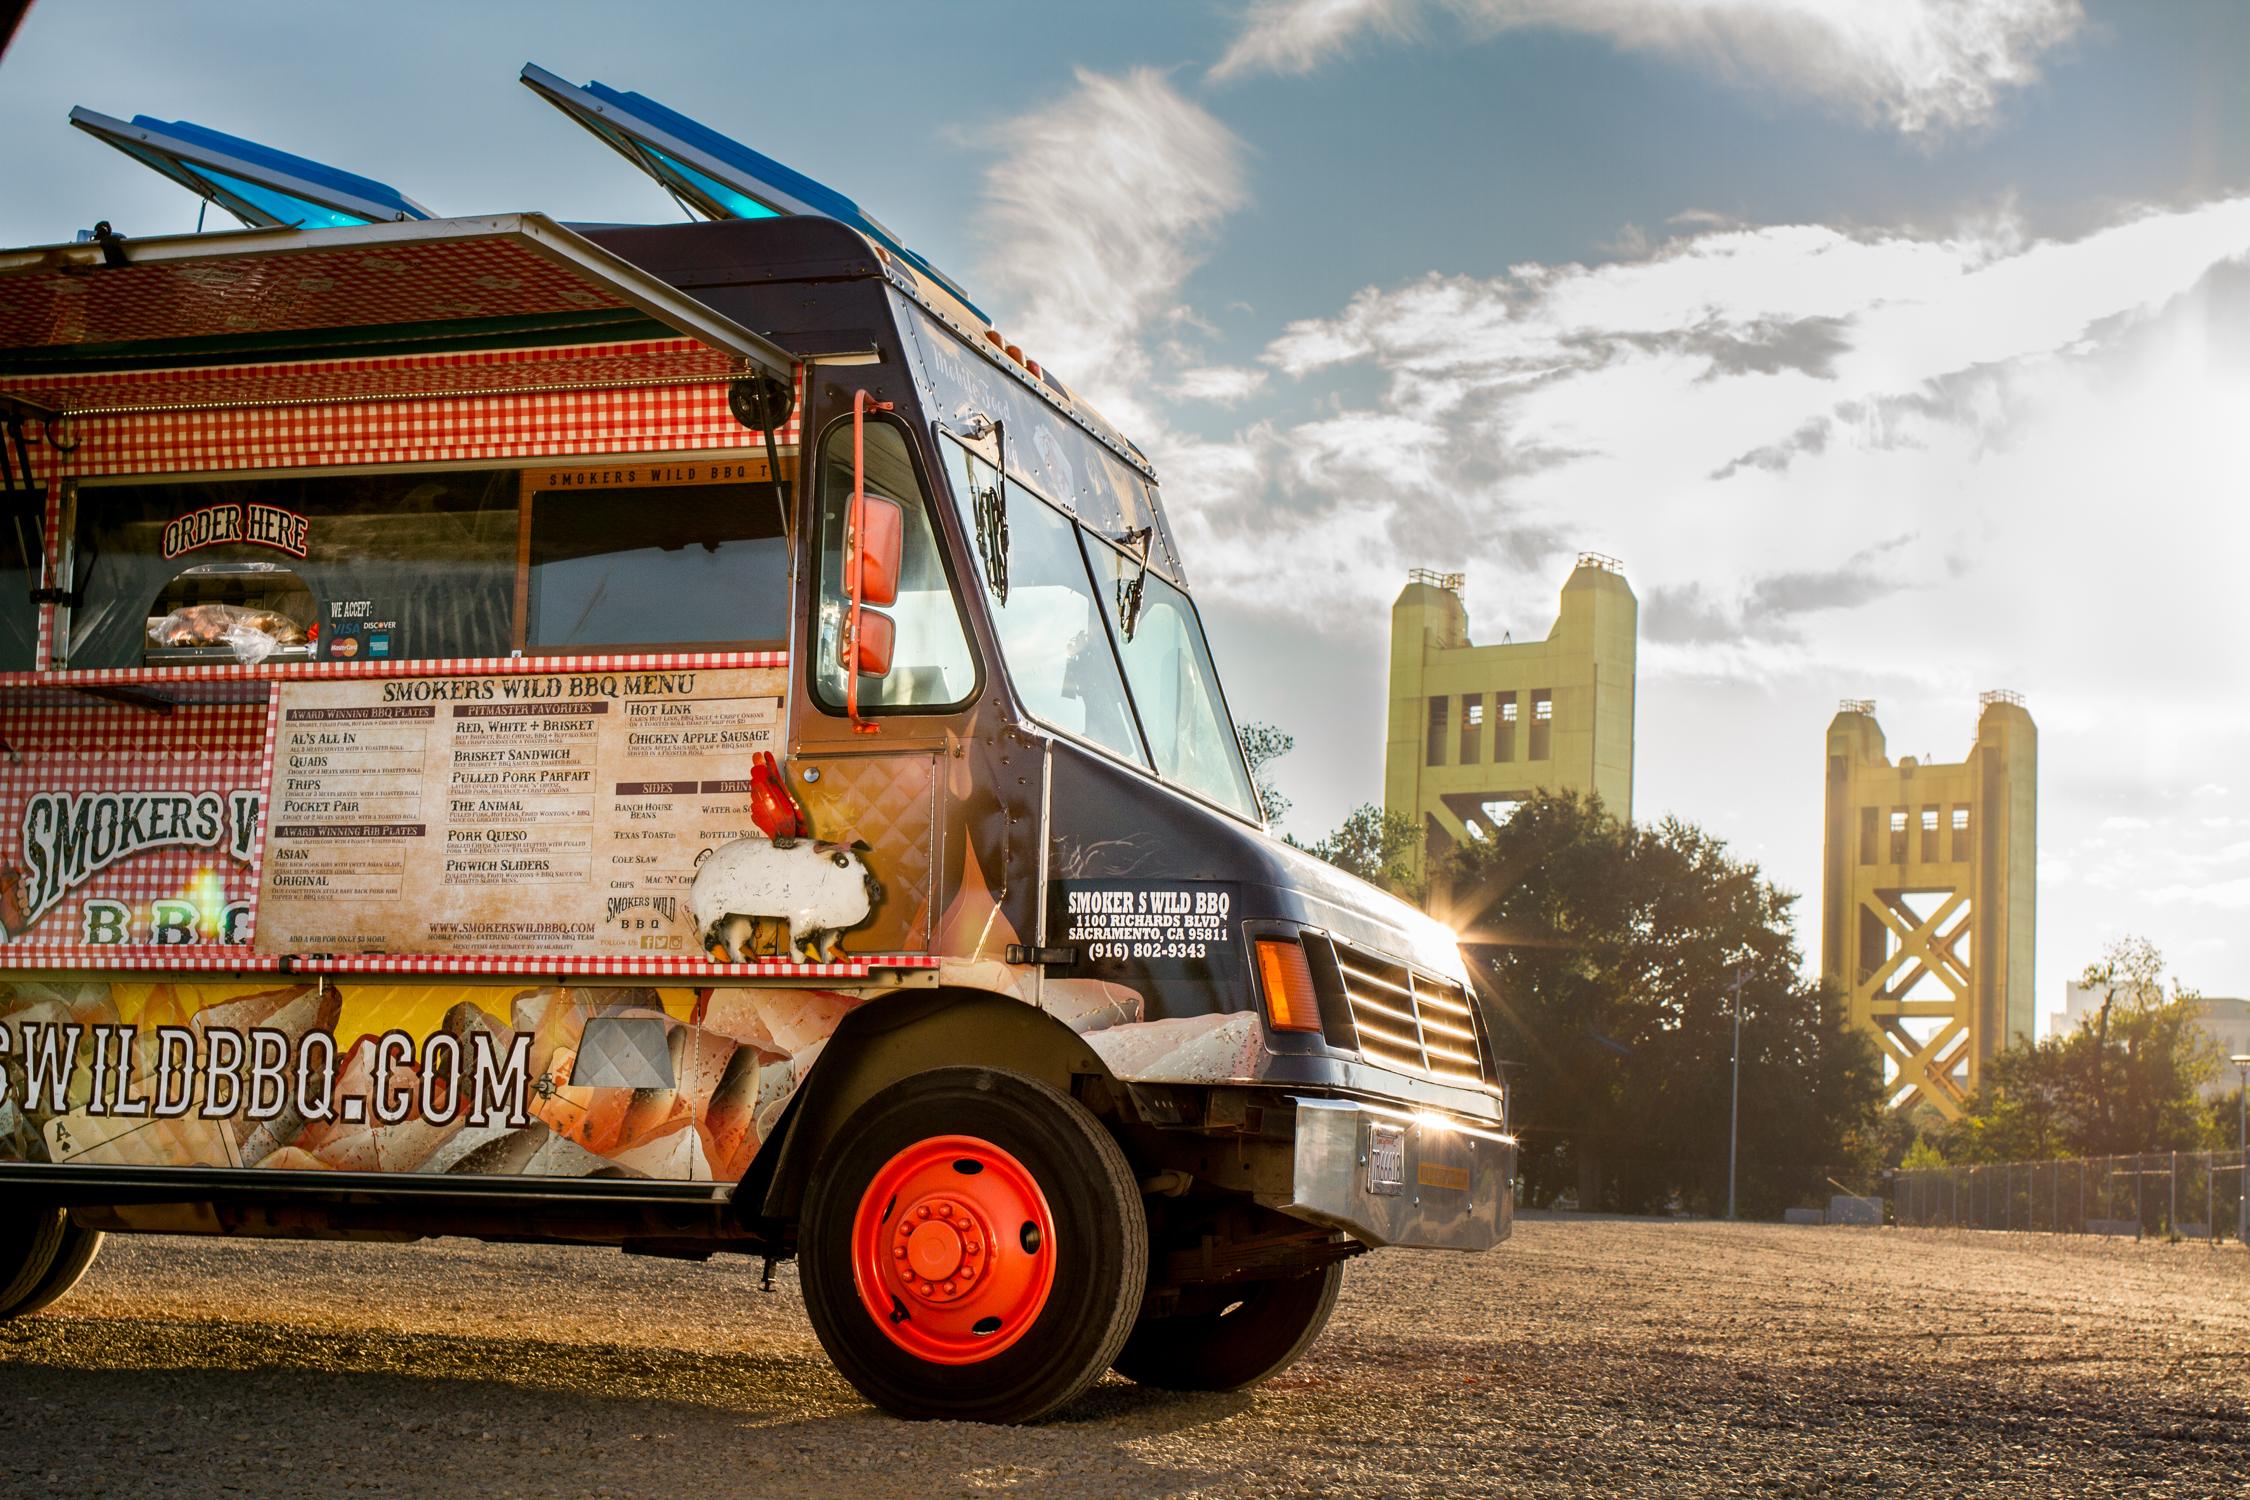 Smokers Wild BBQ food truck